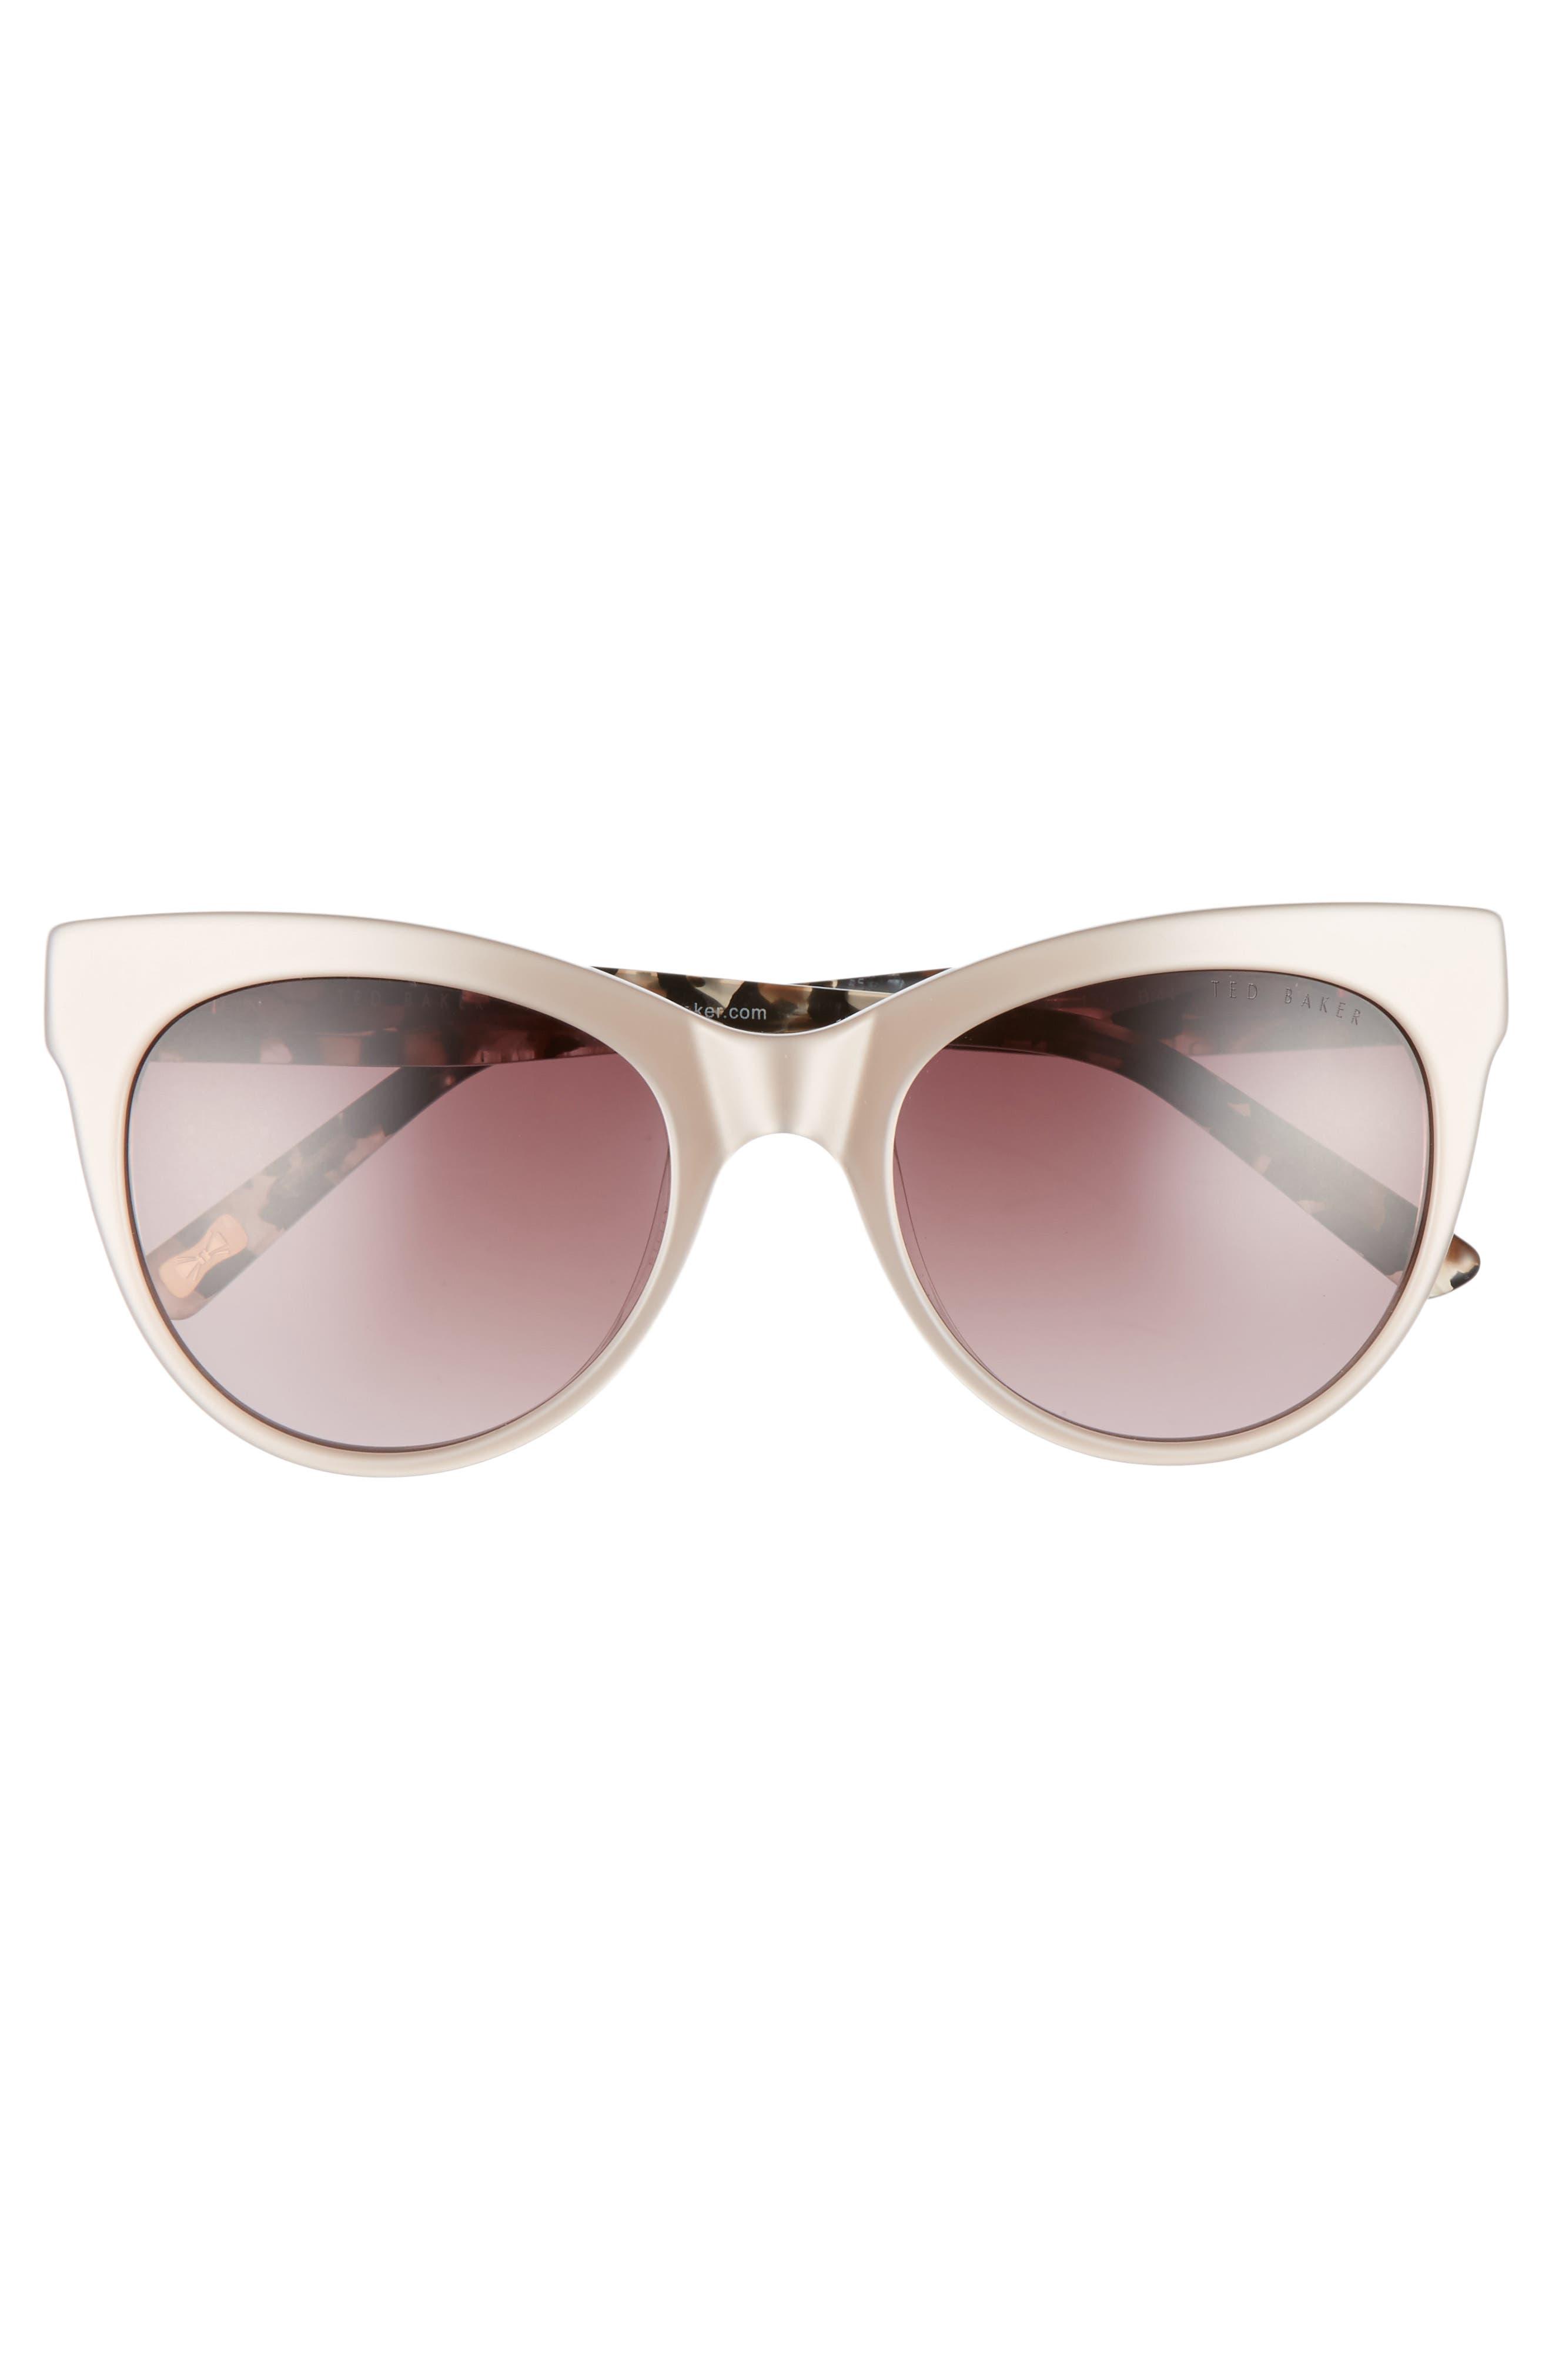 51mm Cat Eye Sunglasses,                             Alternate thumbnail 3, color,                             200